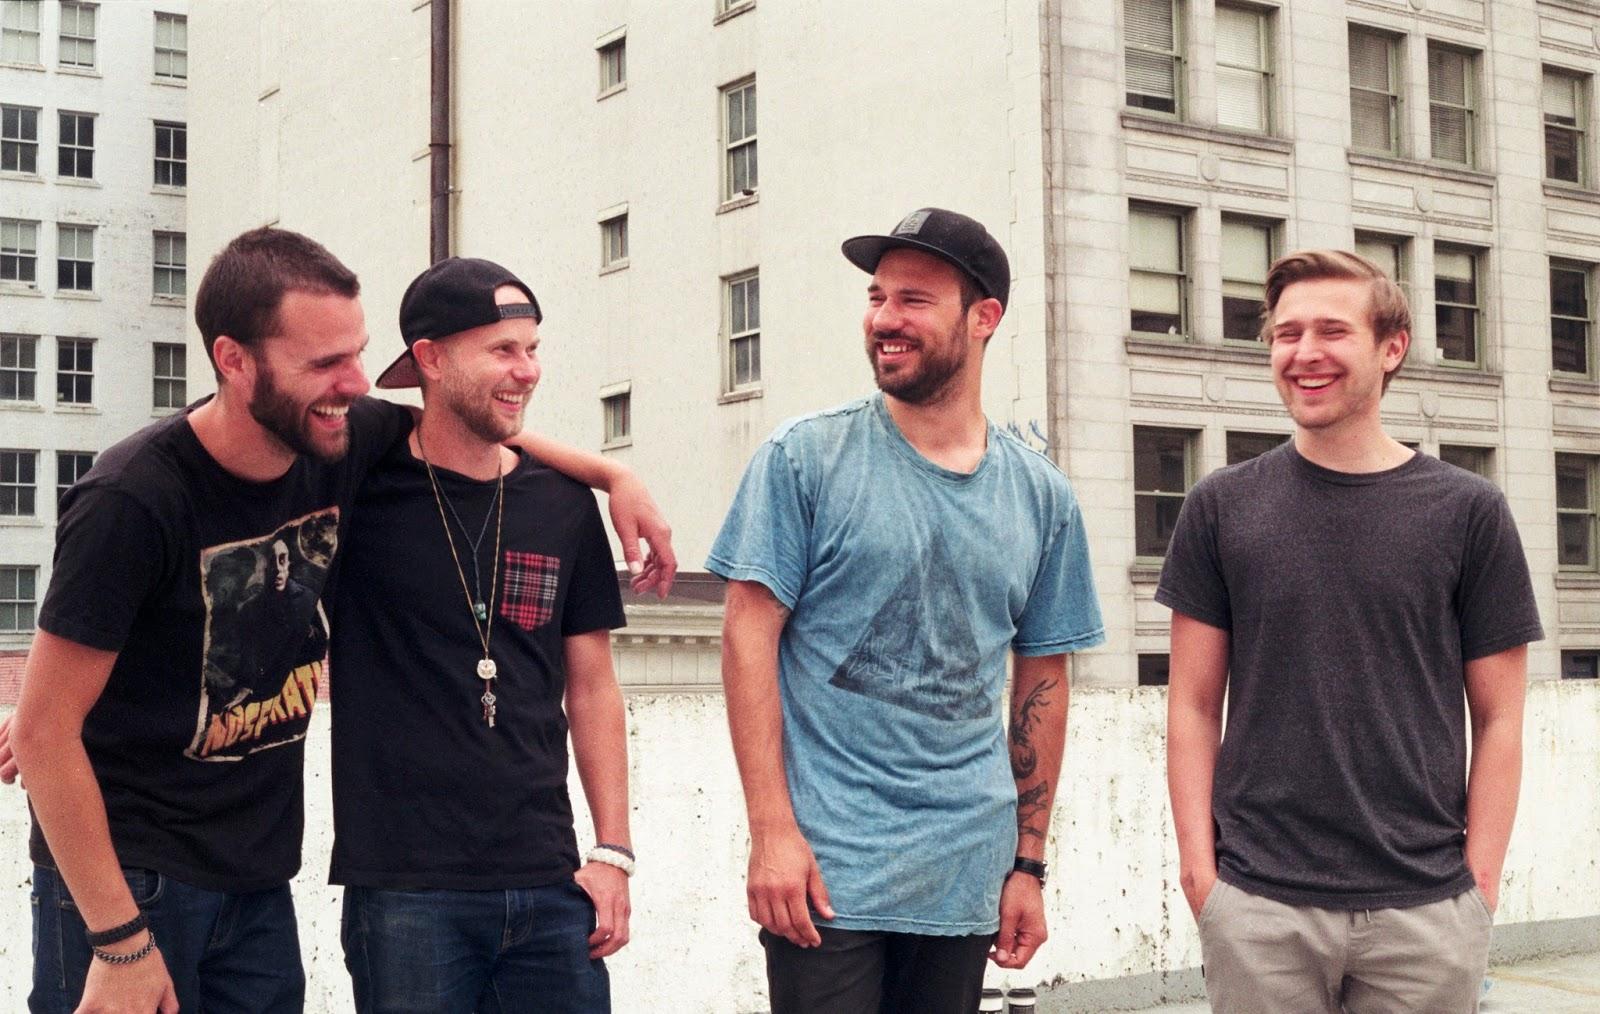 Birch Street Radio: New music from new & 'classic' artists